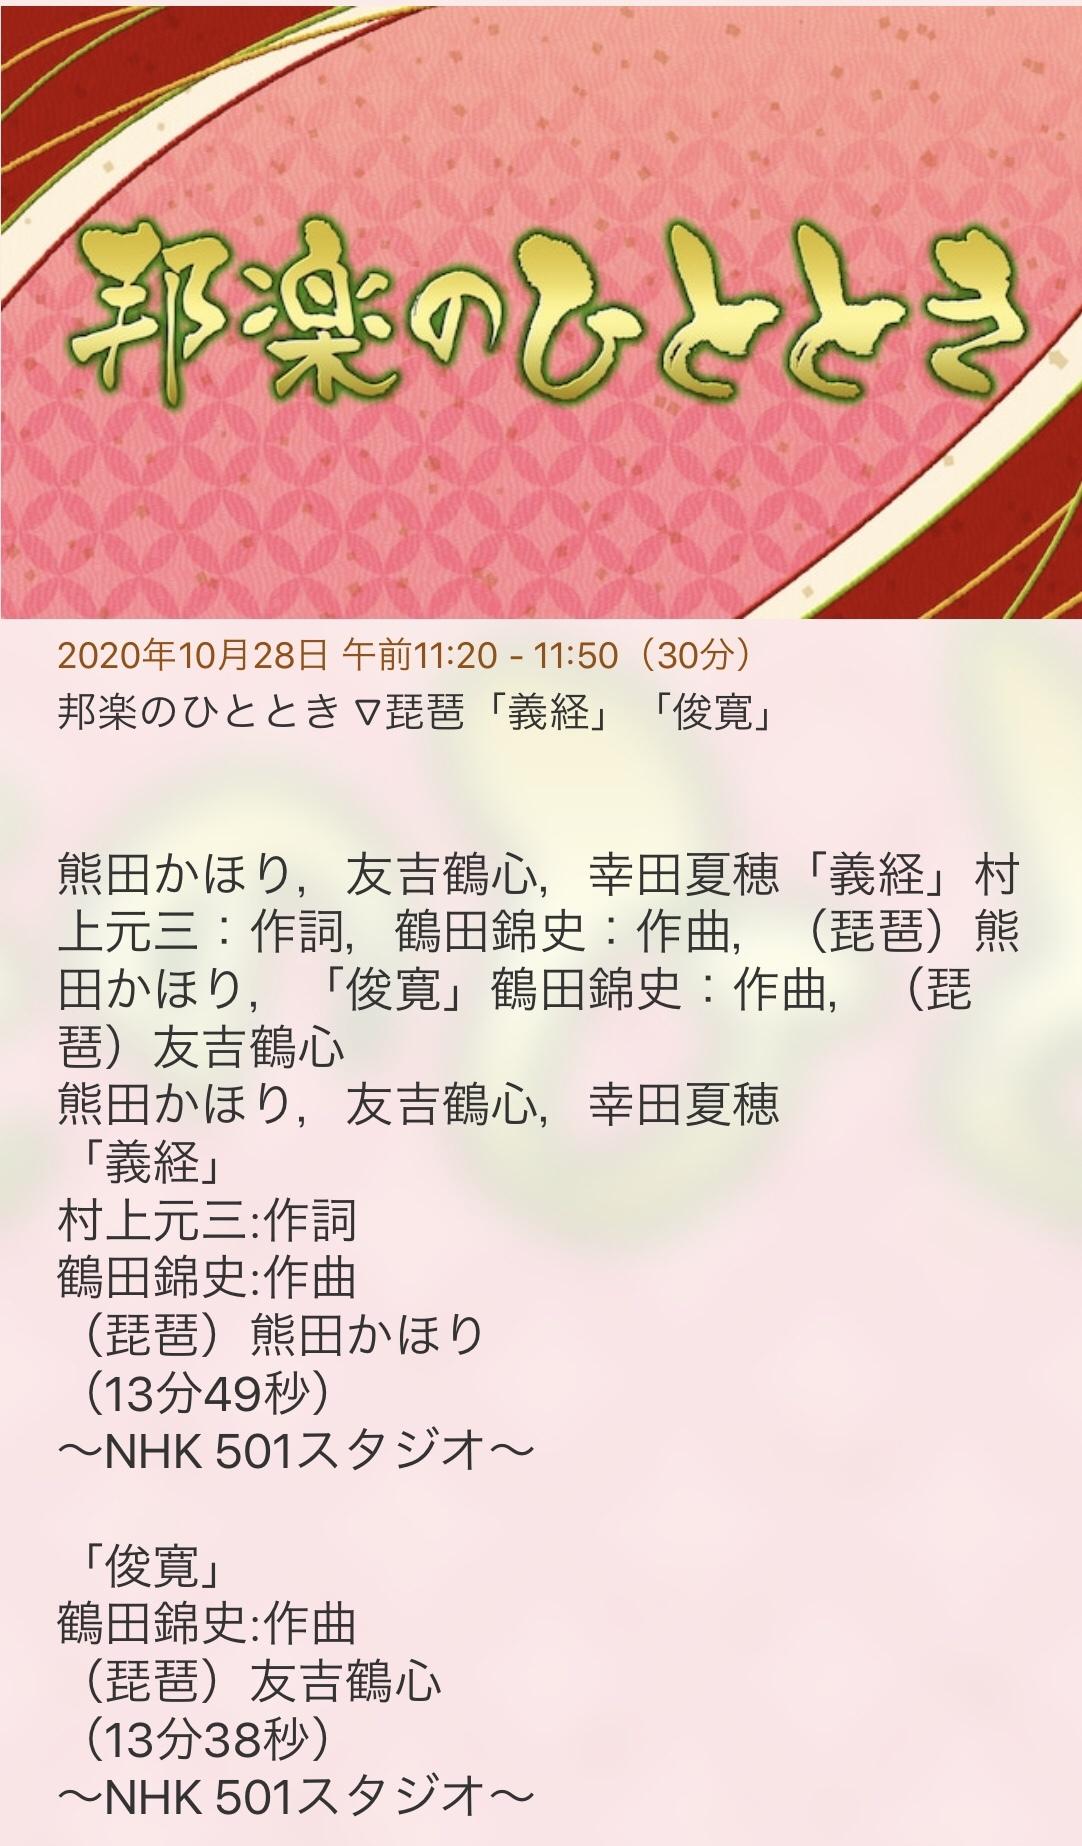 NHK-FM 邦楽のひととき【2020年10月28日‐10月29日】=終了=_c0366731_07374061.jpeg